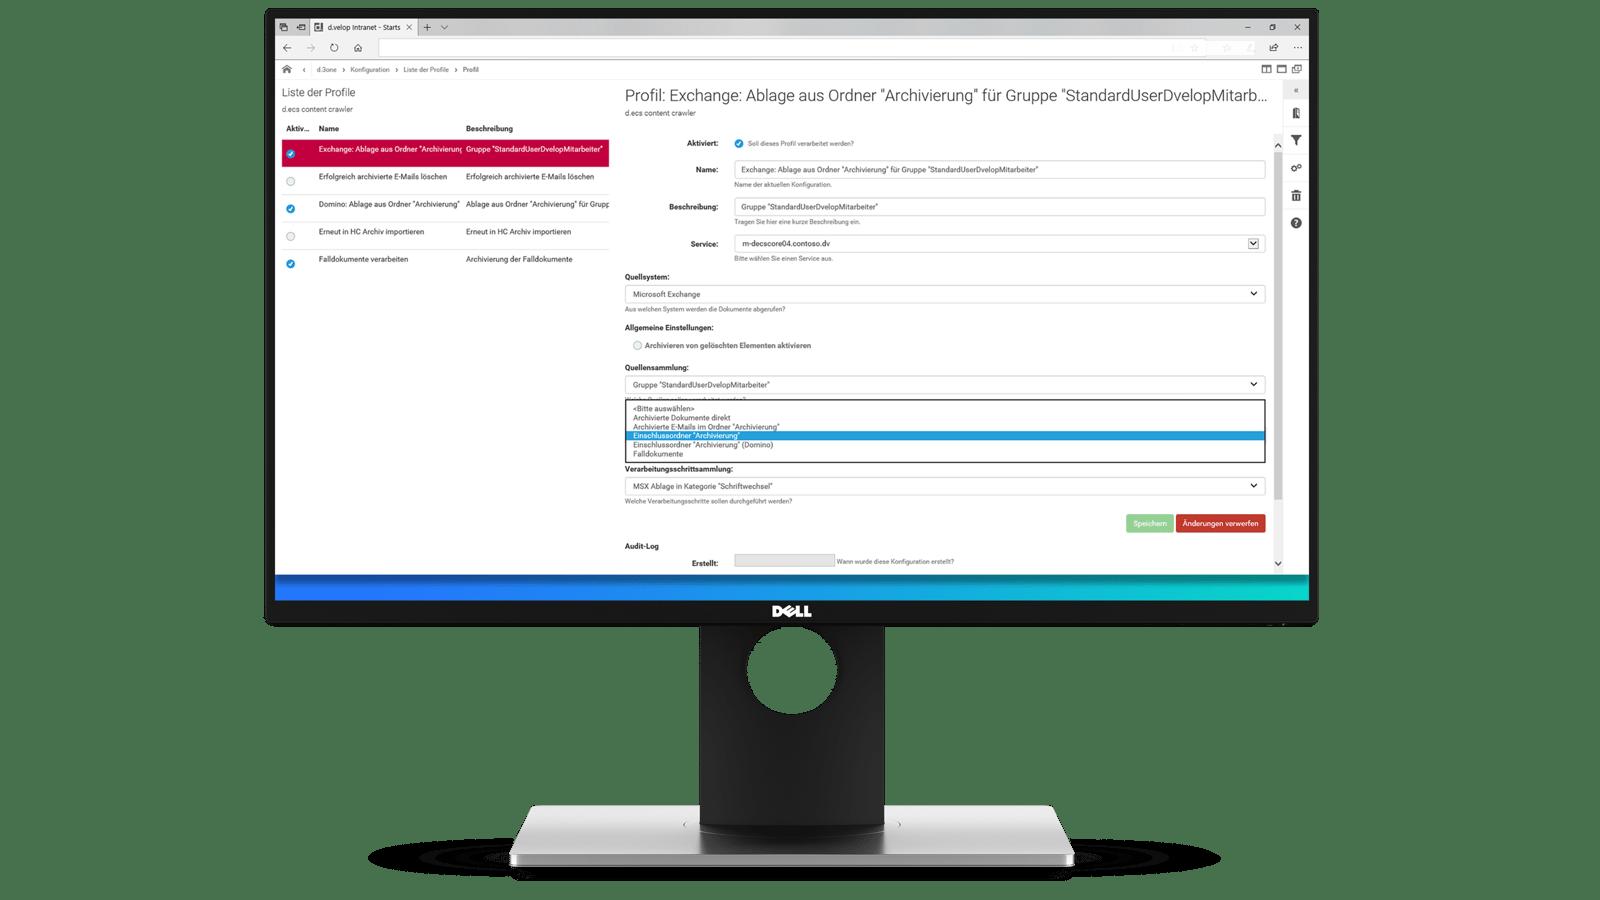 dvelop-e-mail-archivierung-administration